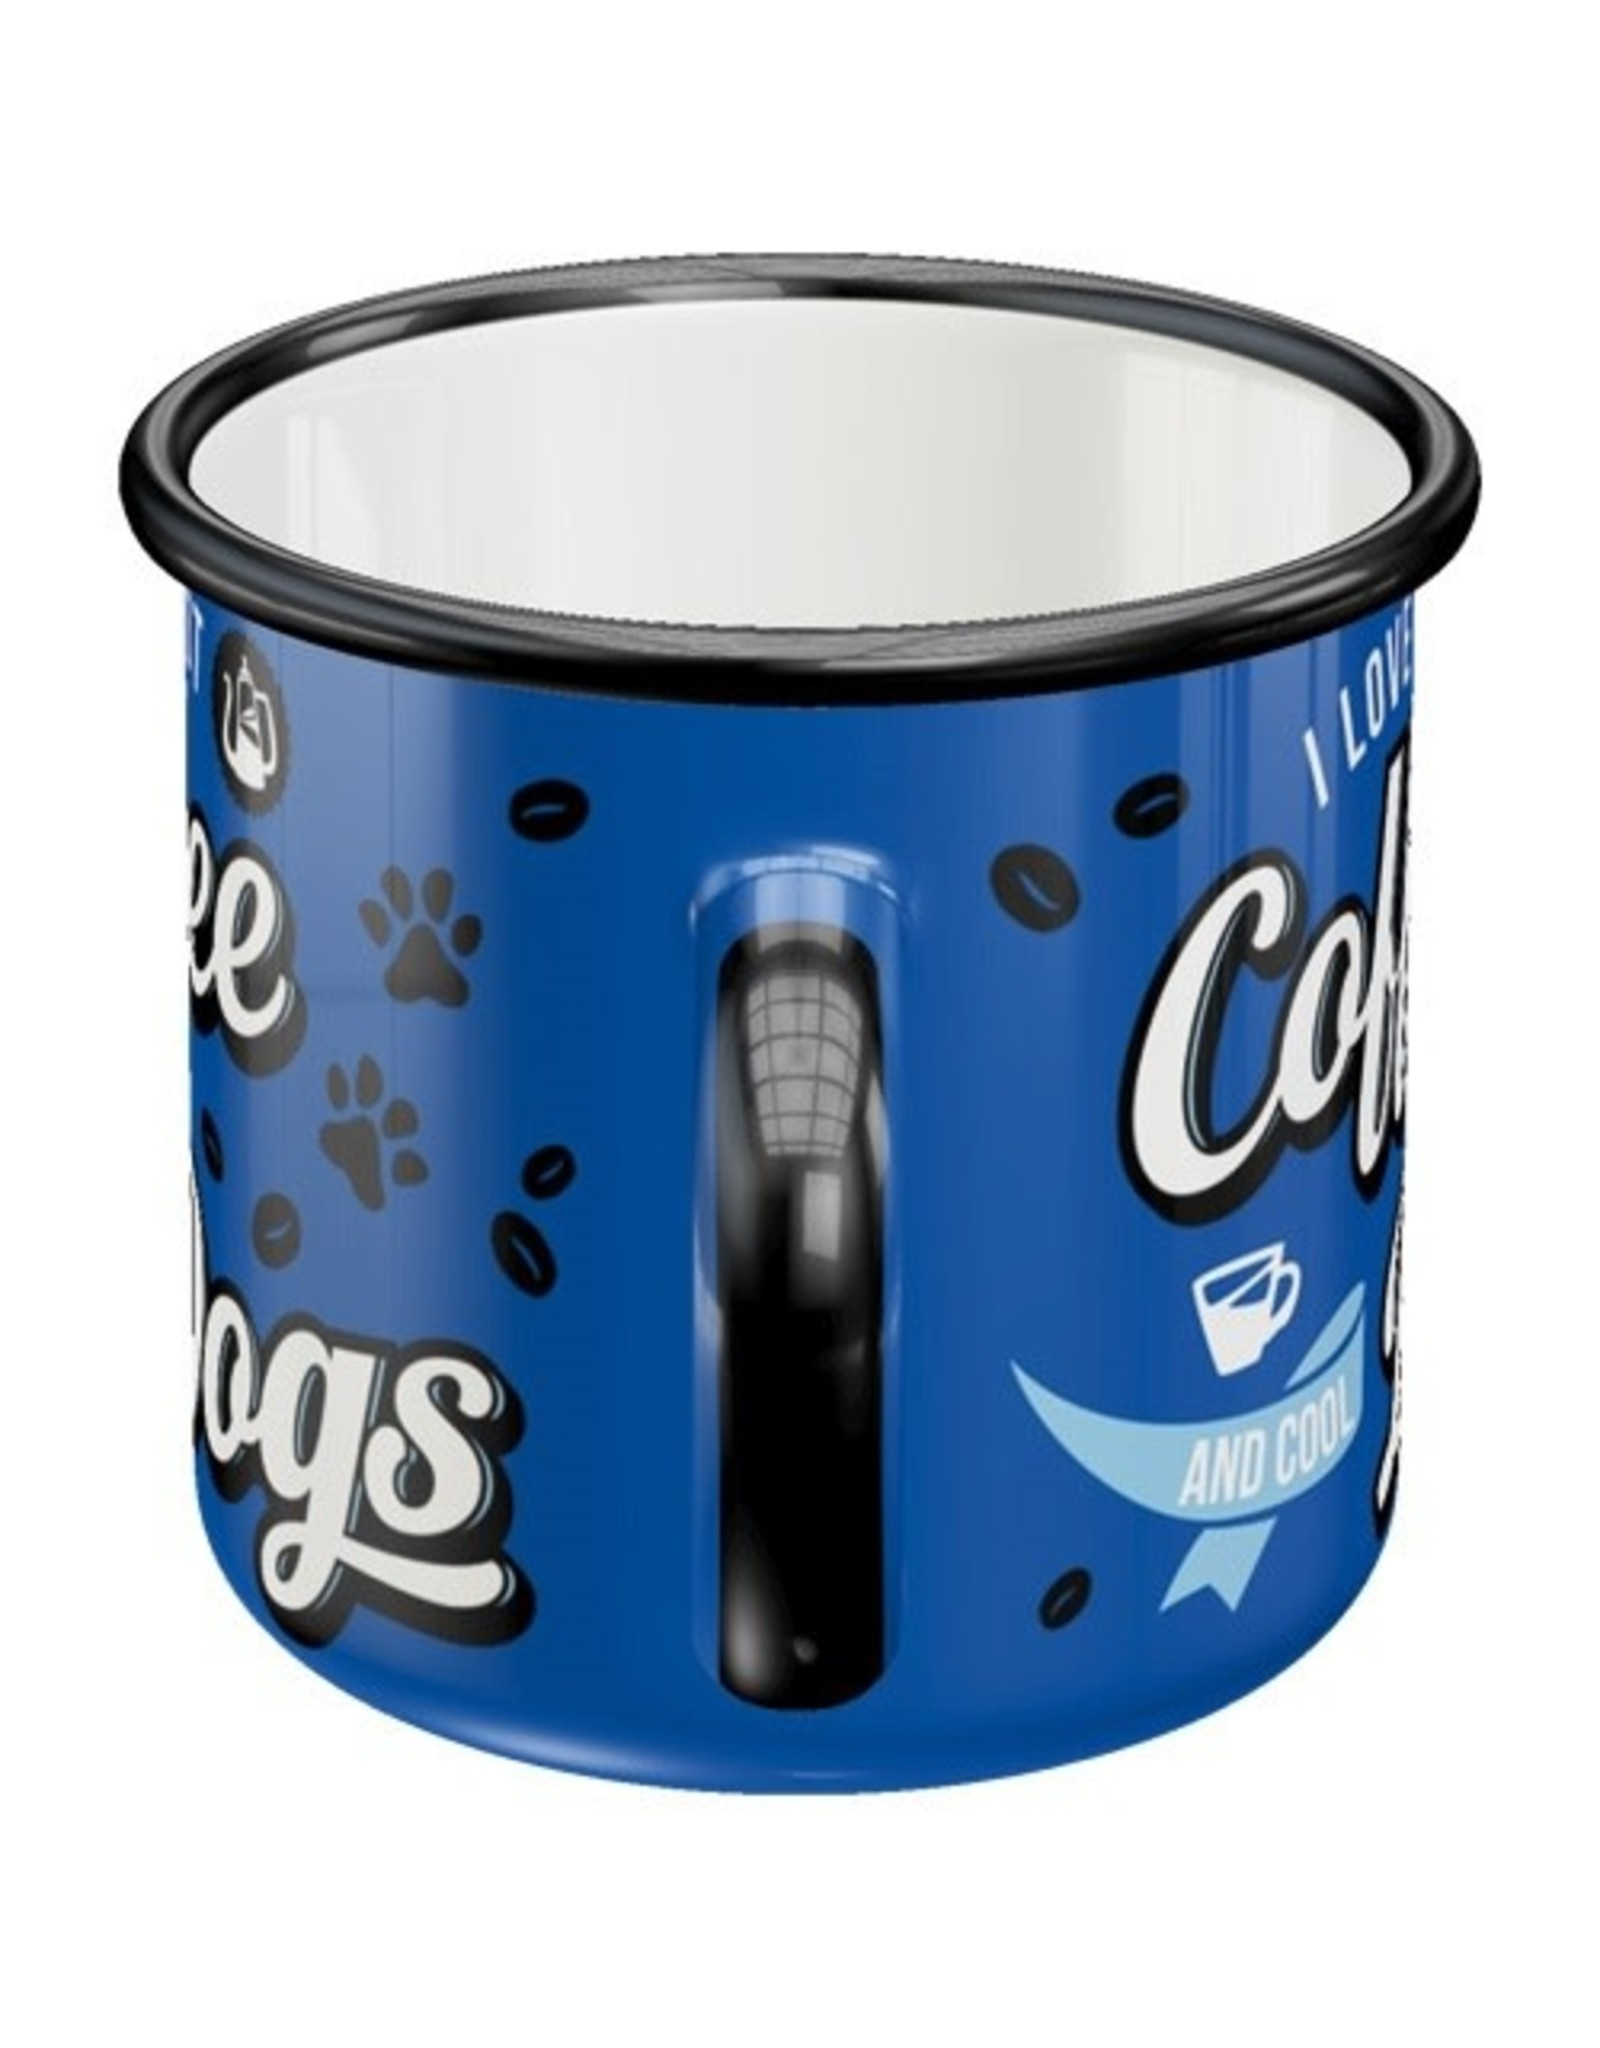 Nostalgic Art enamel mug - coffee & dogs